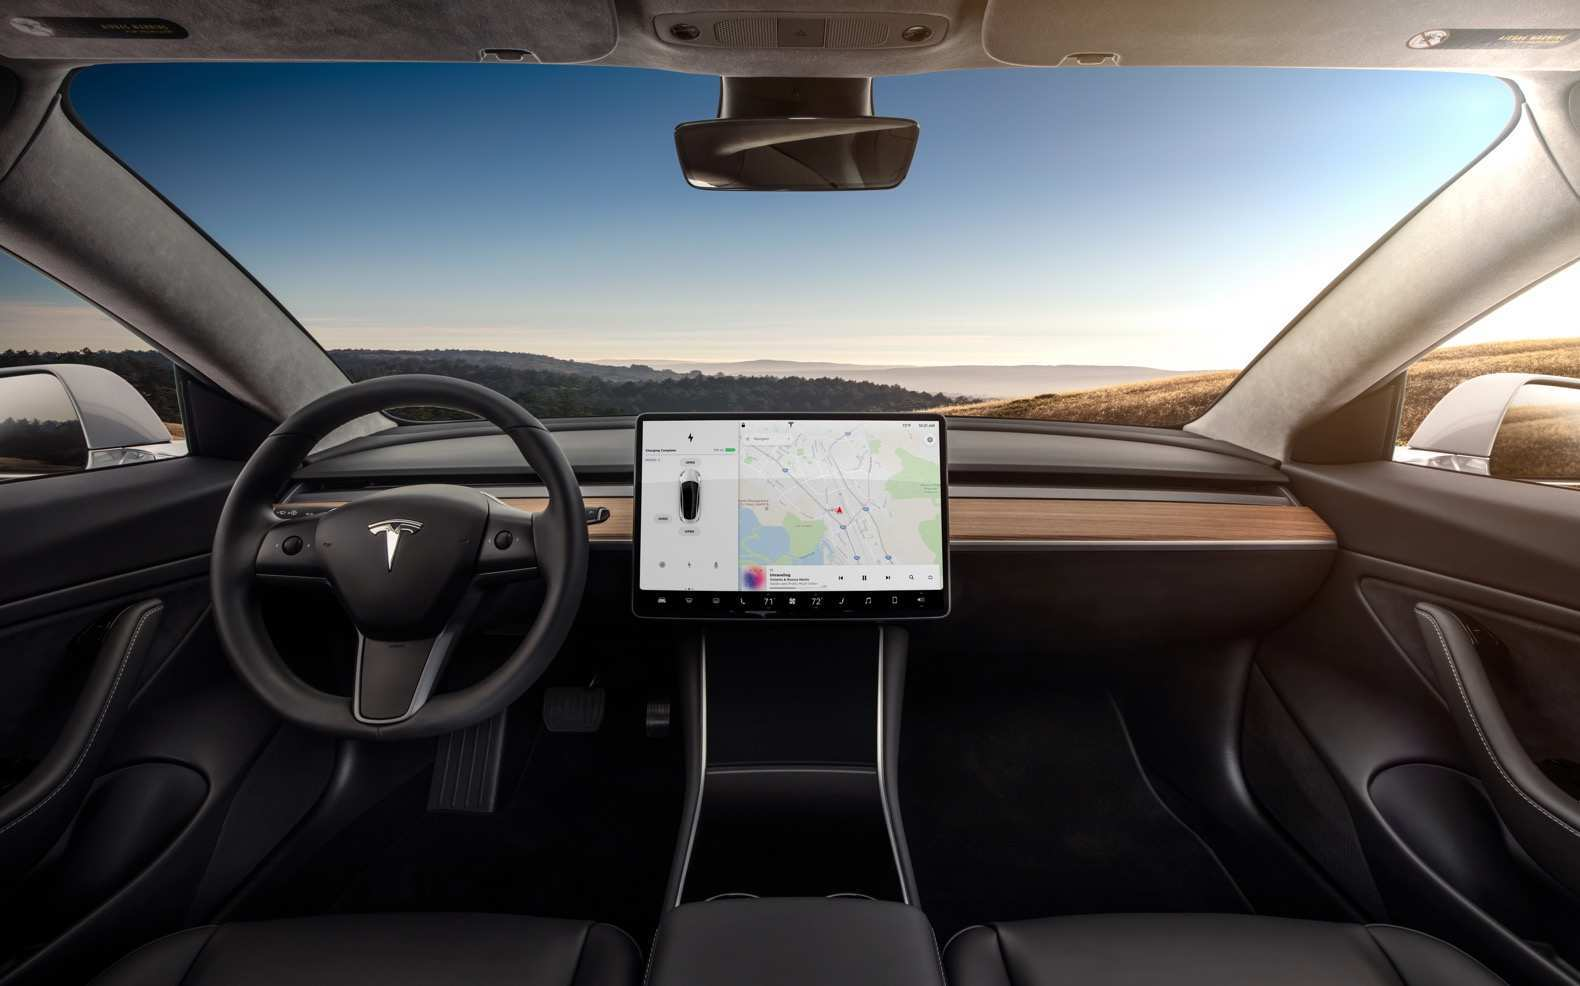 57 Gallery of Tesla X 2020 Images with Tesla X 2020